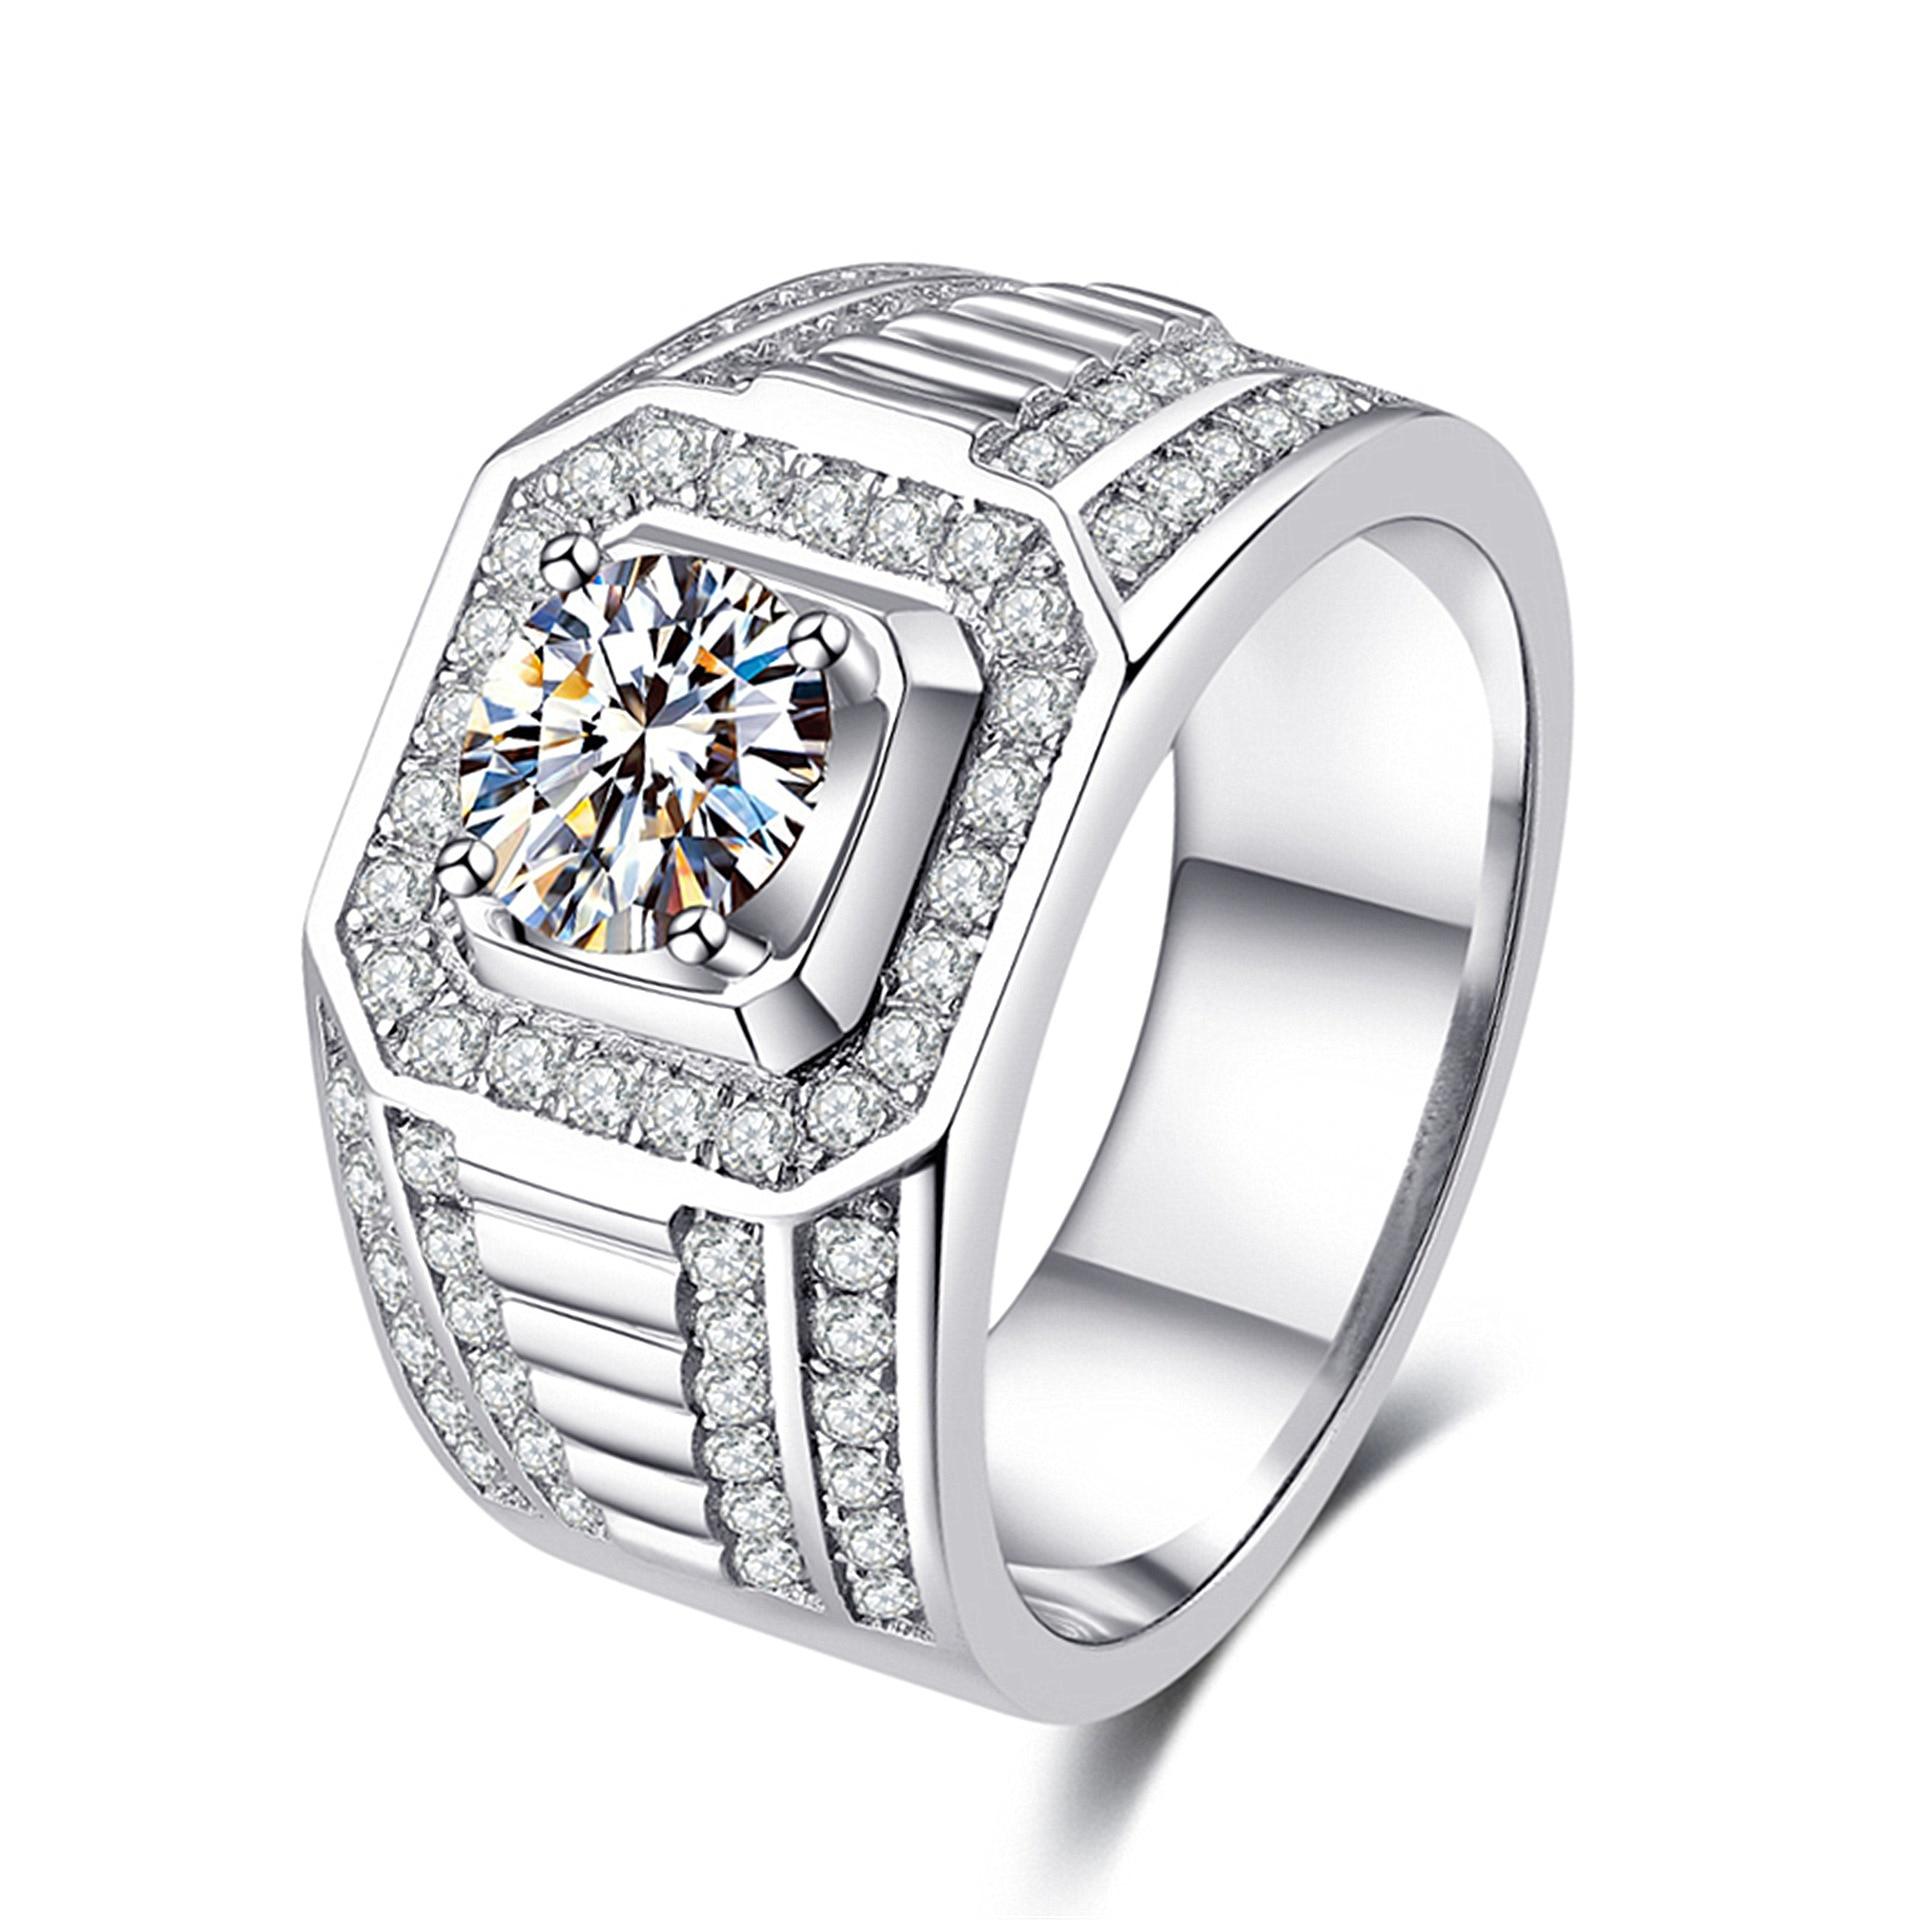 14K Gold Diamond Ring For Men Anillos De Wedding Bizuteria Gemstone Topaz Jewelry 14K Gold Hip Bizuteria Engagement Diamond Ring